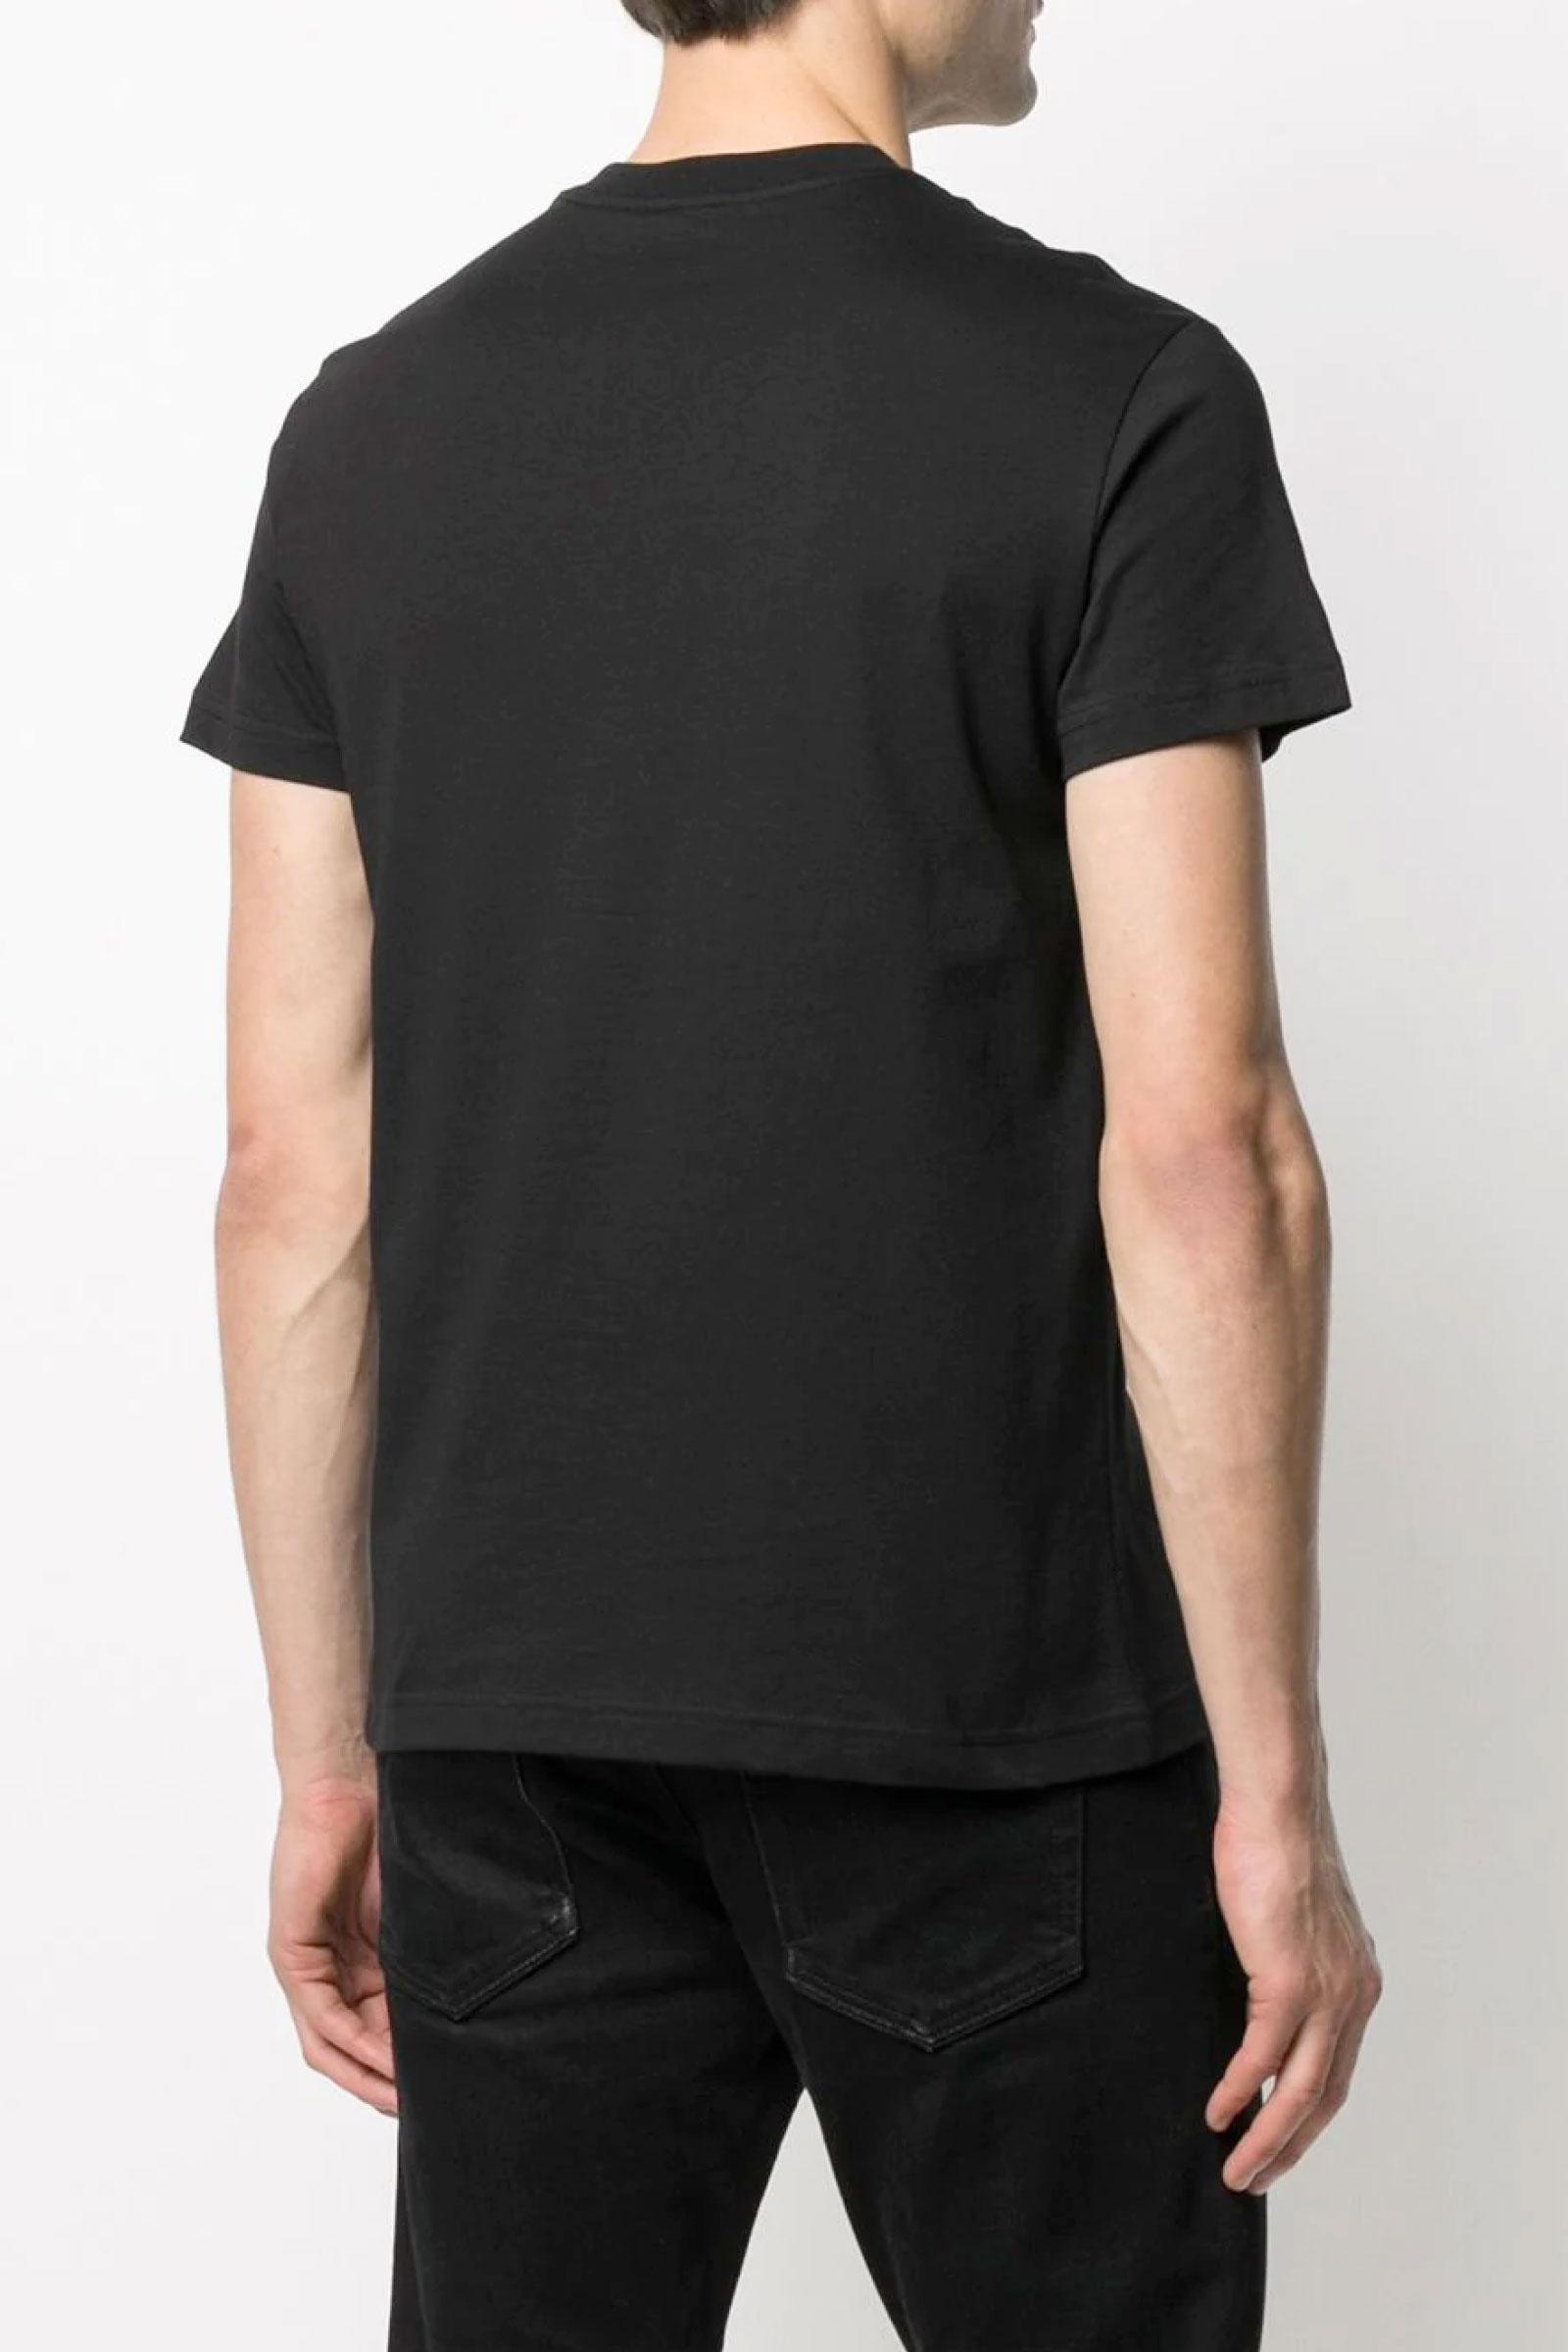 VERSACE JEANS COUTURE T-Shirt Uomo VERSACE JEANS COUTURE | T-Shirt | B3GWA7TE30319K42